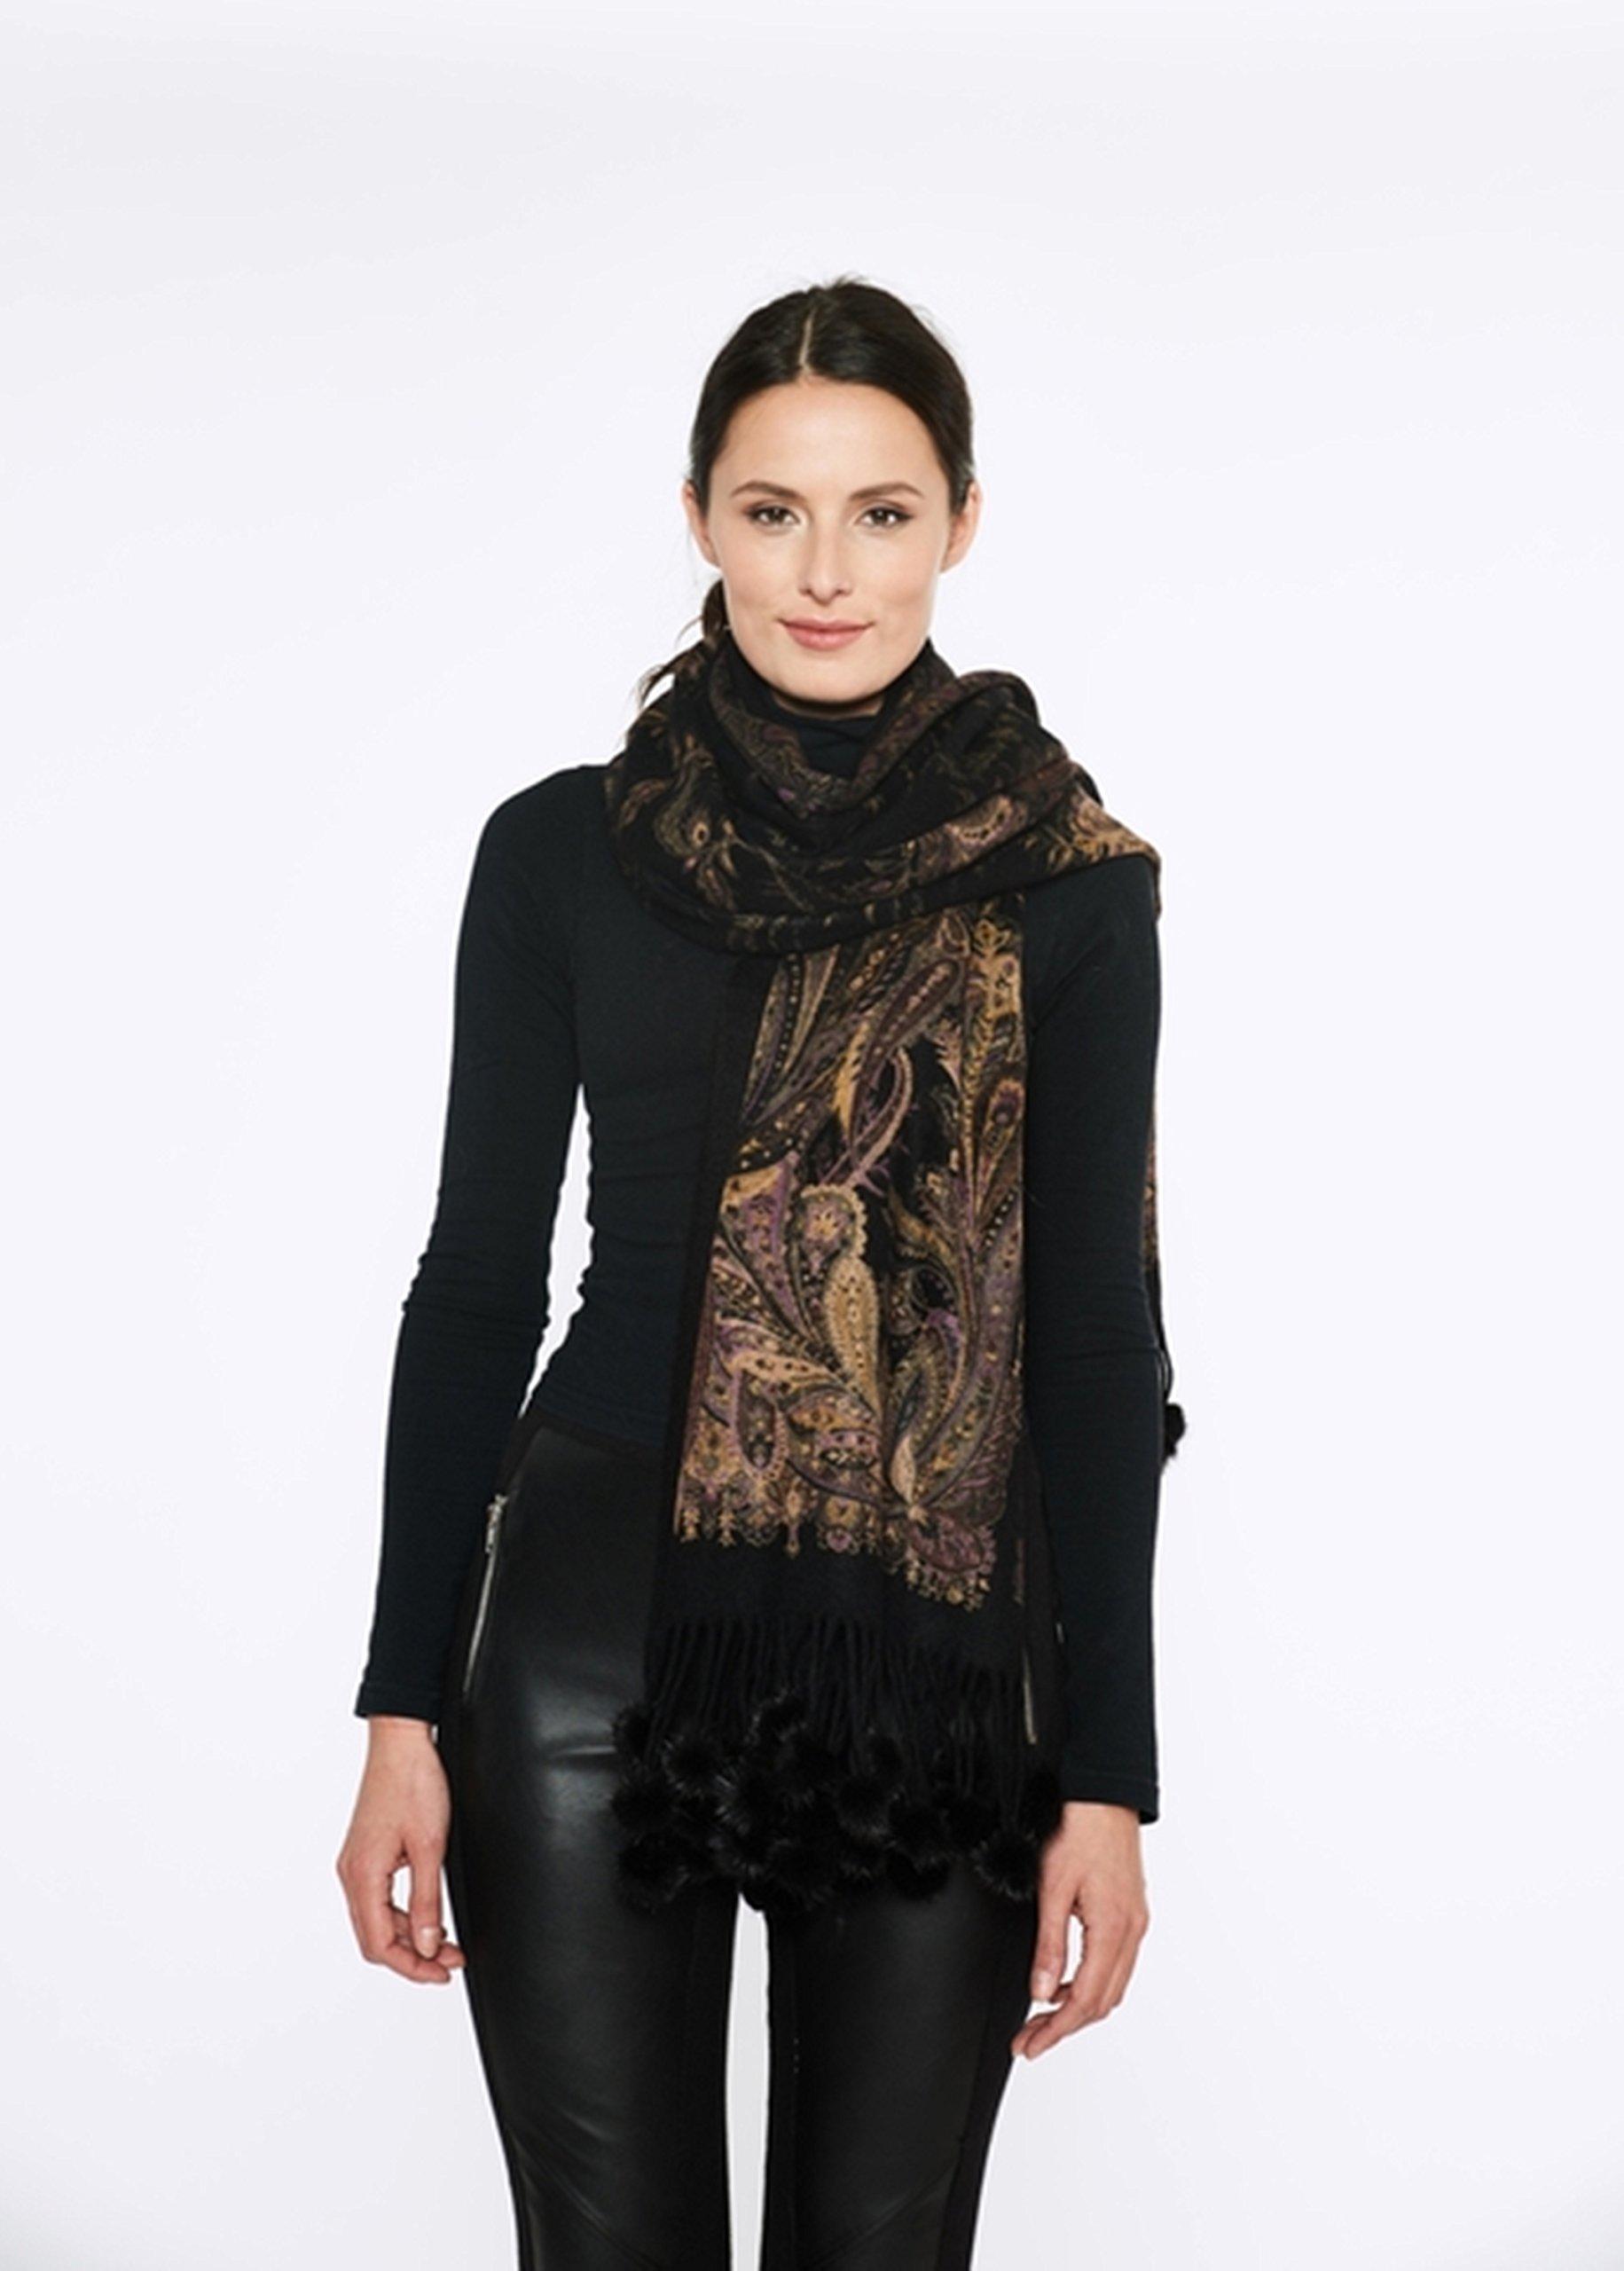 Cashmere Pashmina Group-Cashmere Shawl Scarf Wrap Stole (Solid/ Reversible Print w/ Genuine Fur) - Mink Black by Cashmere Pashmina Group (Image #2)